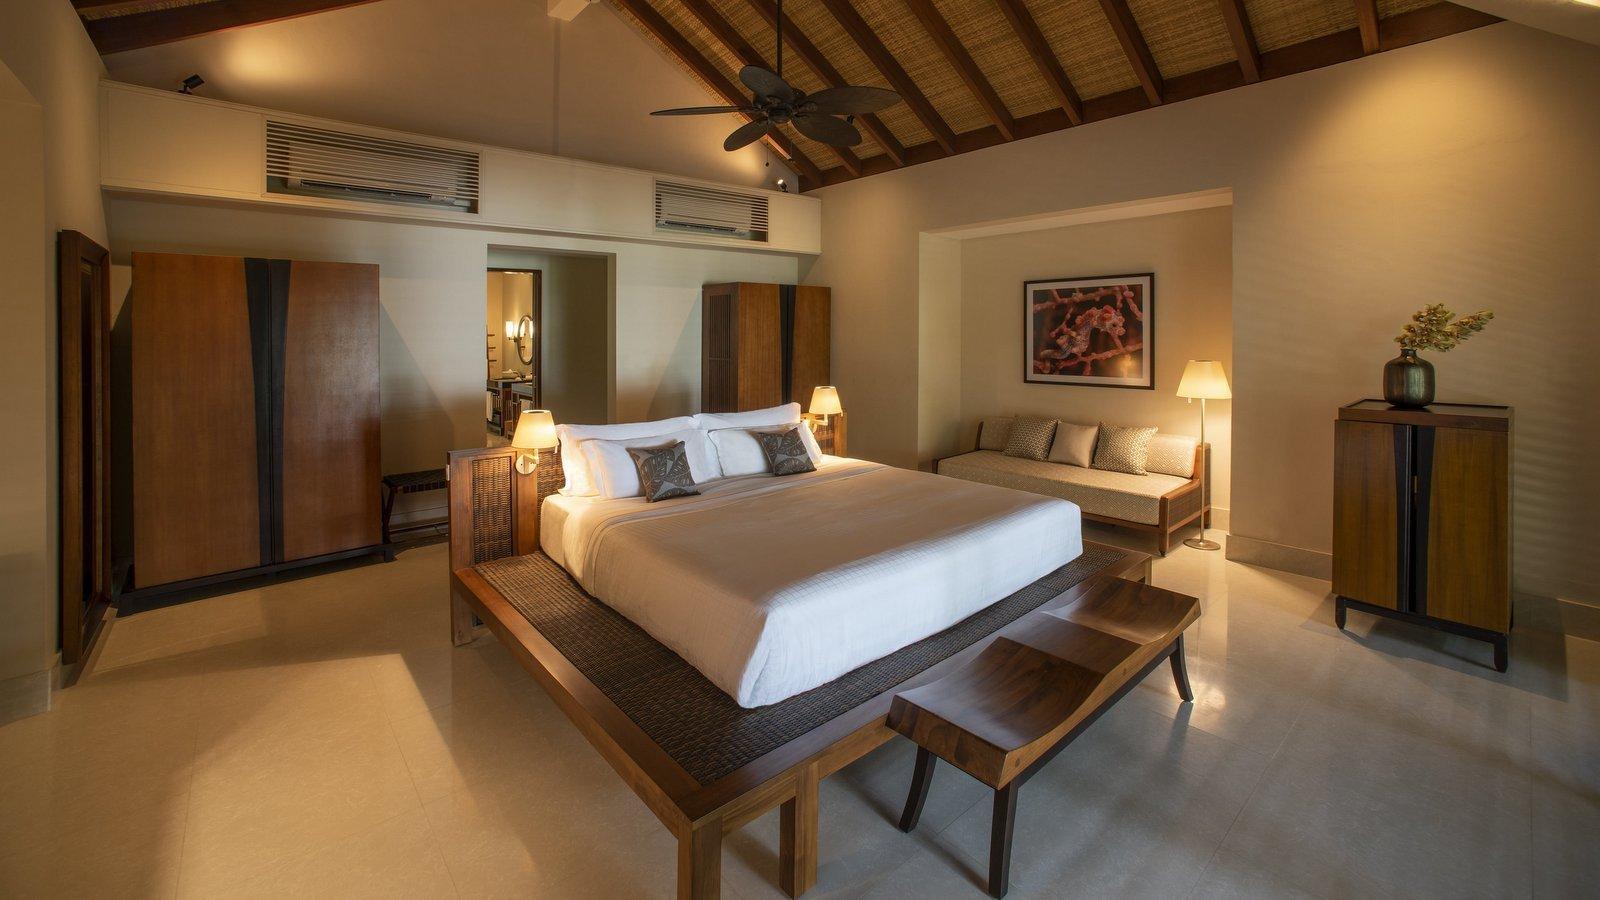 Мальдивы, отель The Residence Maldives at Dhigurah, номер Beach Pool Villa